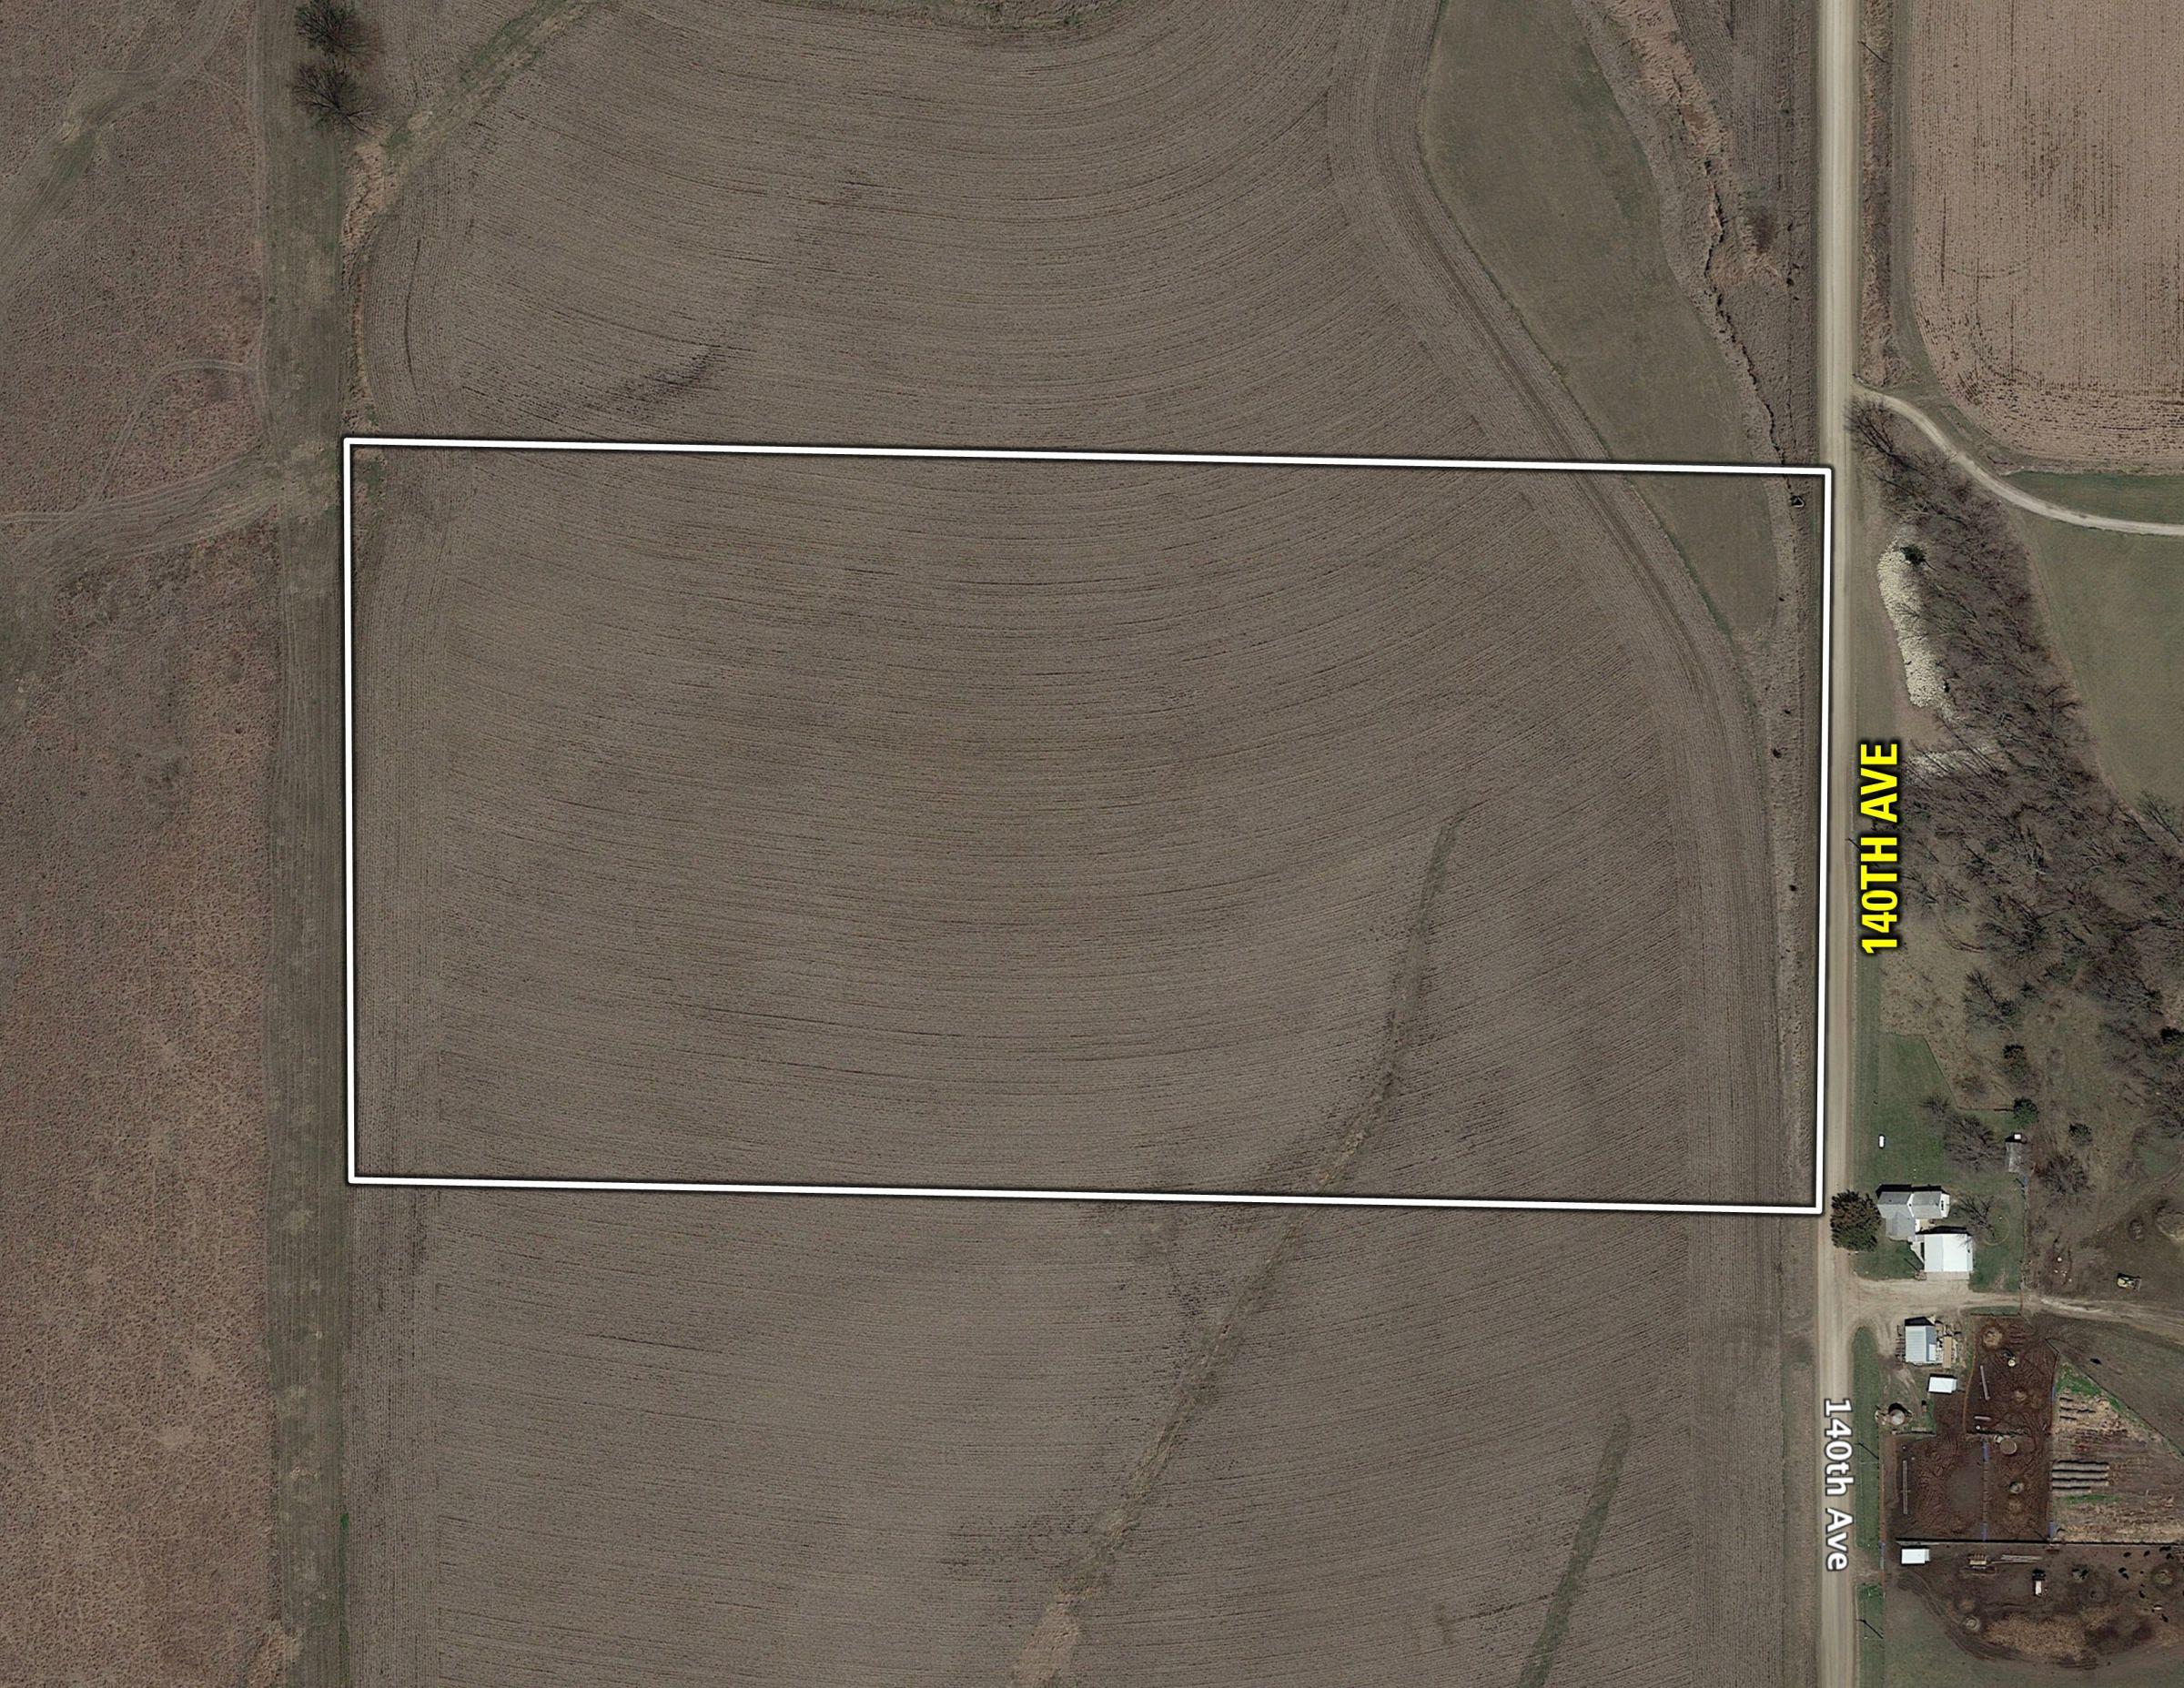 development-land-warren-county-iowa-20-acres-listing-number-15424-0-2021-03-26-185120.jpg